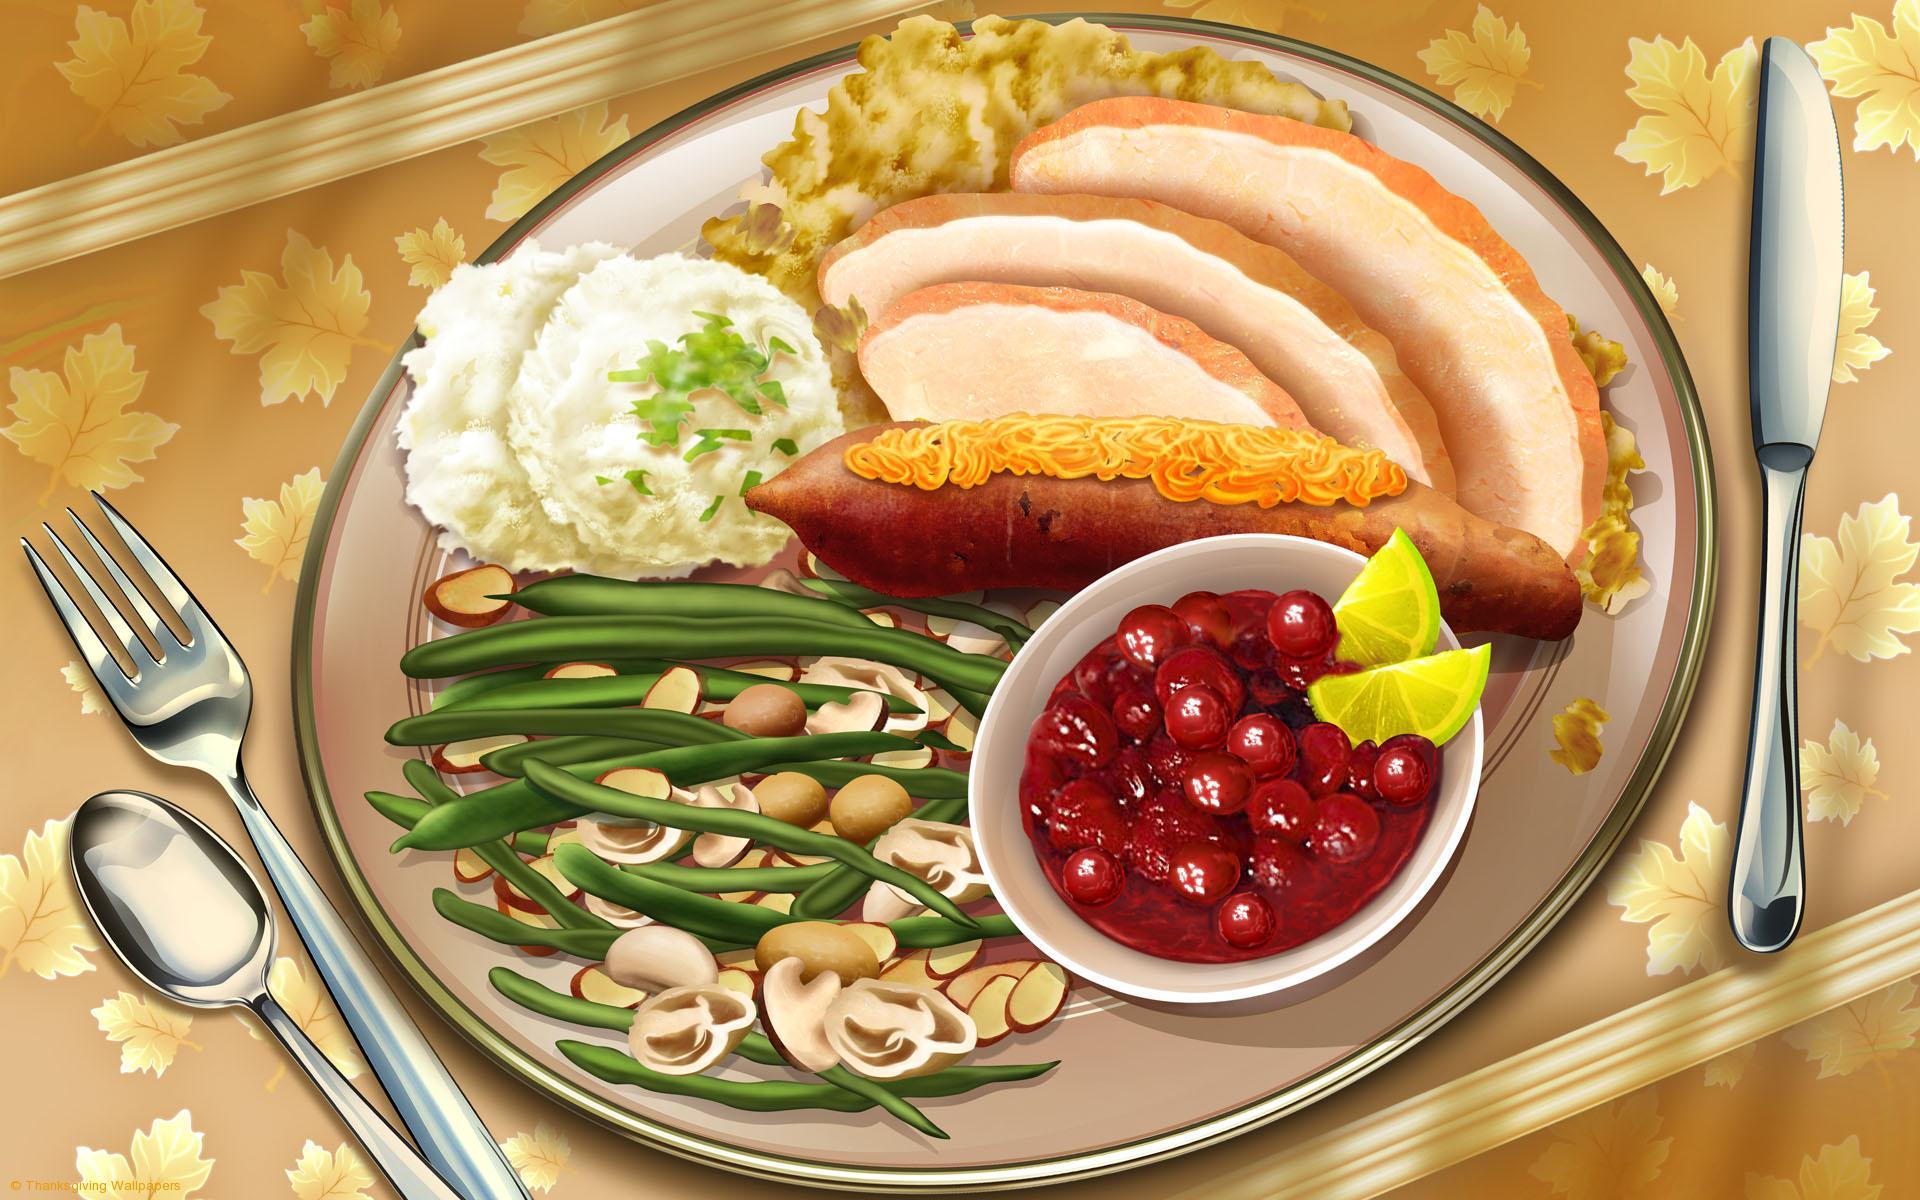 Food Wallpaper Desktop Thanksgiving Food Wallpaper Thanksgiving Food 1920x1200